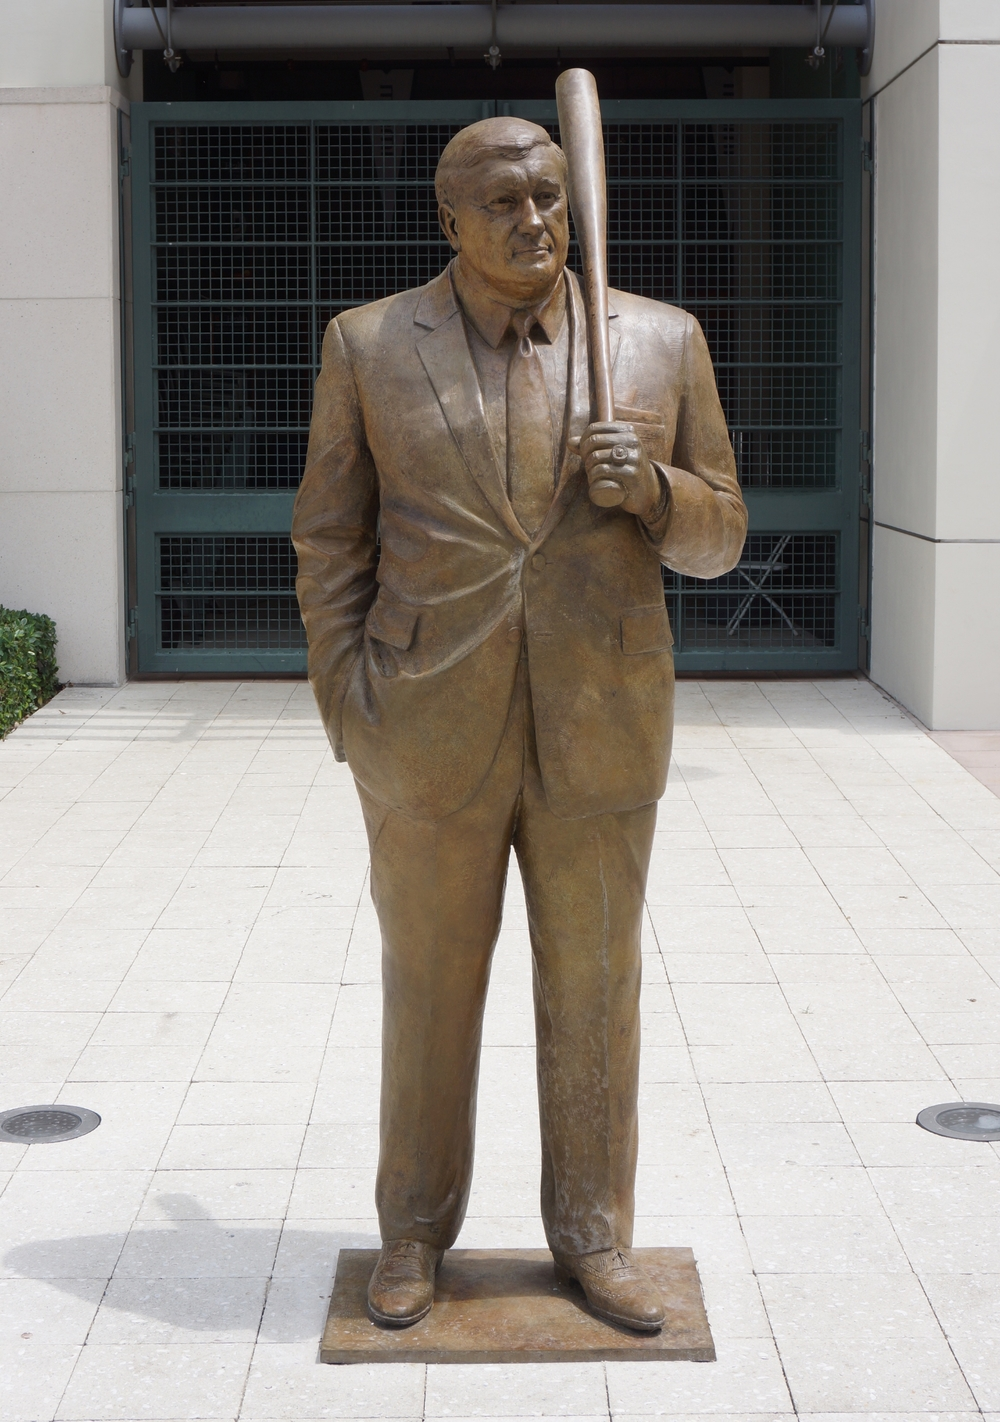 Coach Ron Fraser, portrait statue